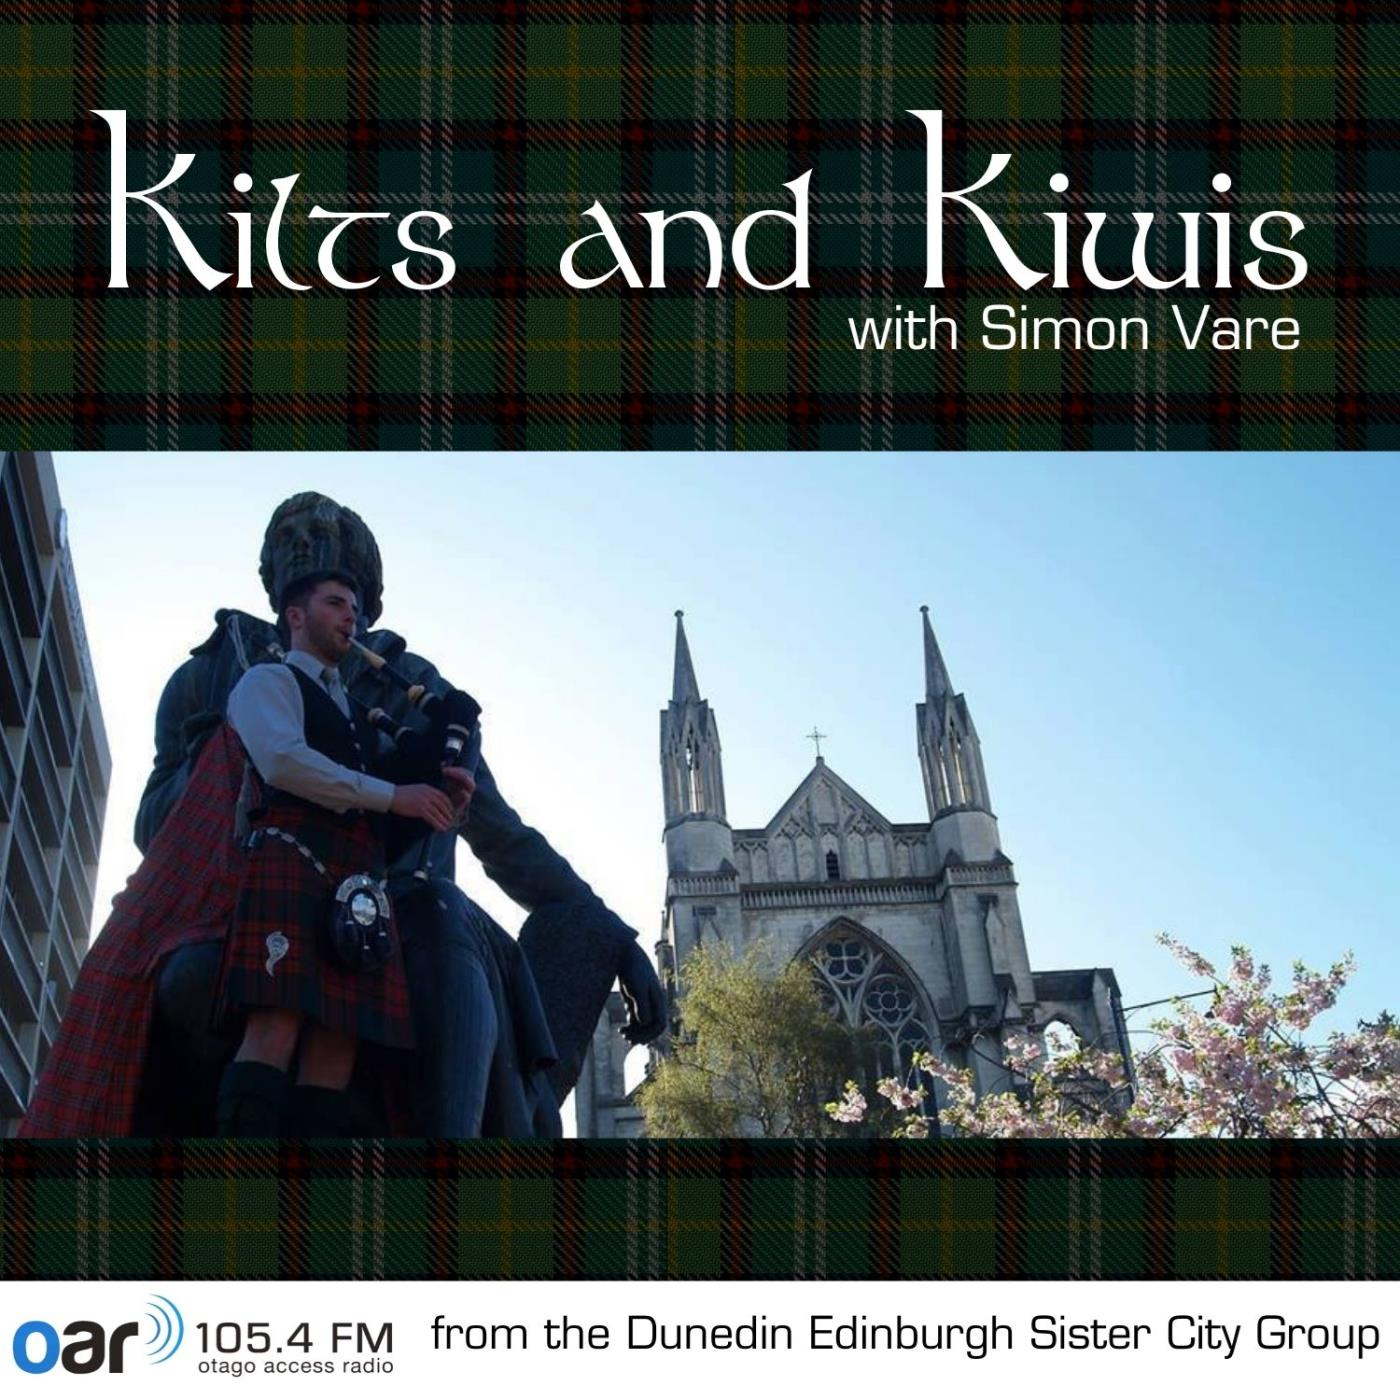 Kilts and Kiwis